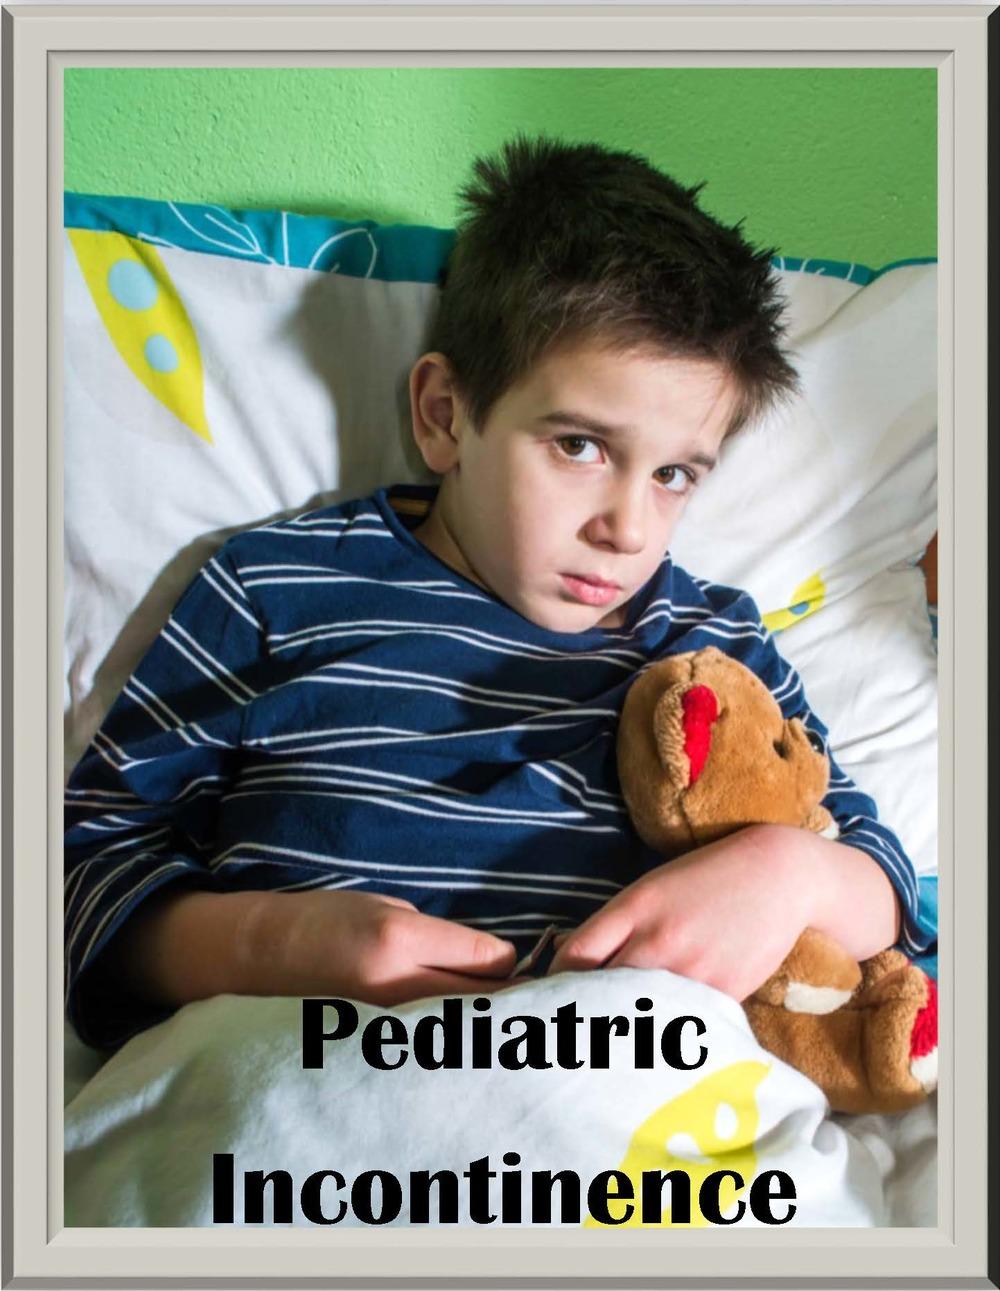 Pediatric Incontinence IC Dysfunctional Elimination